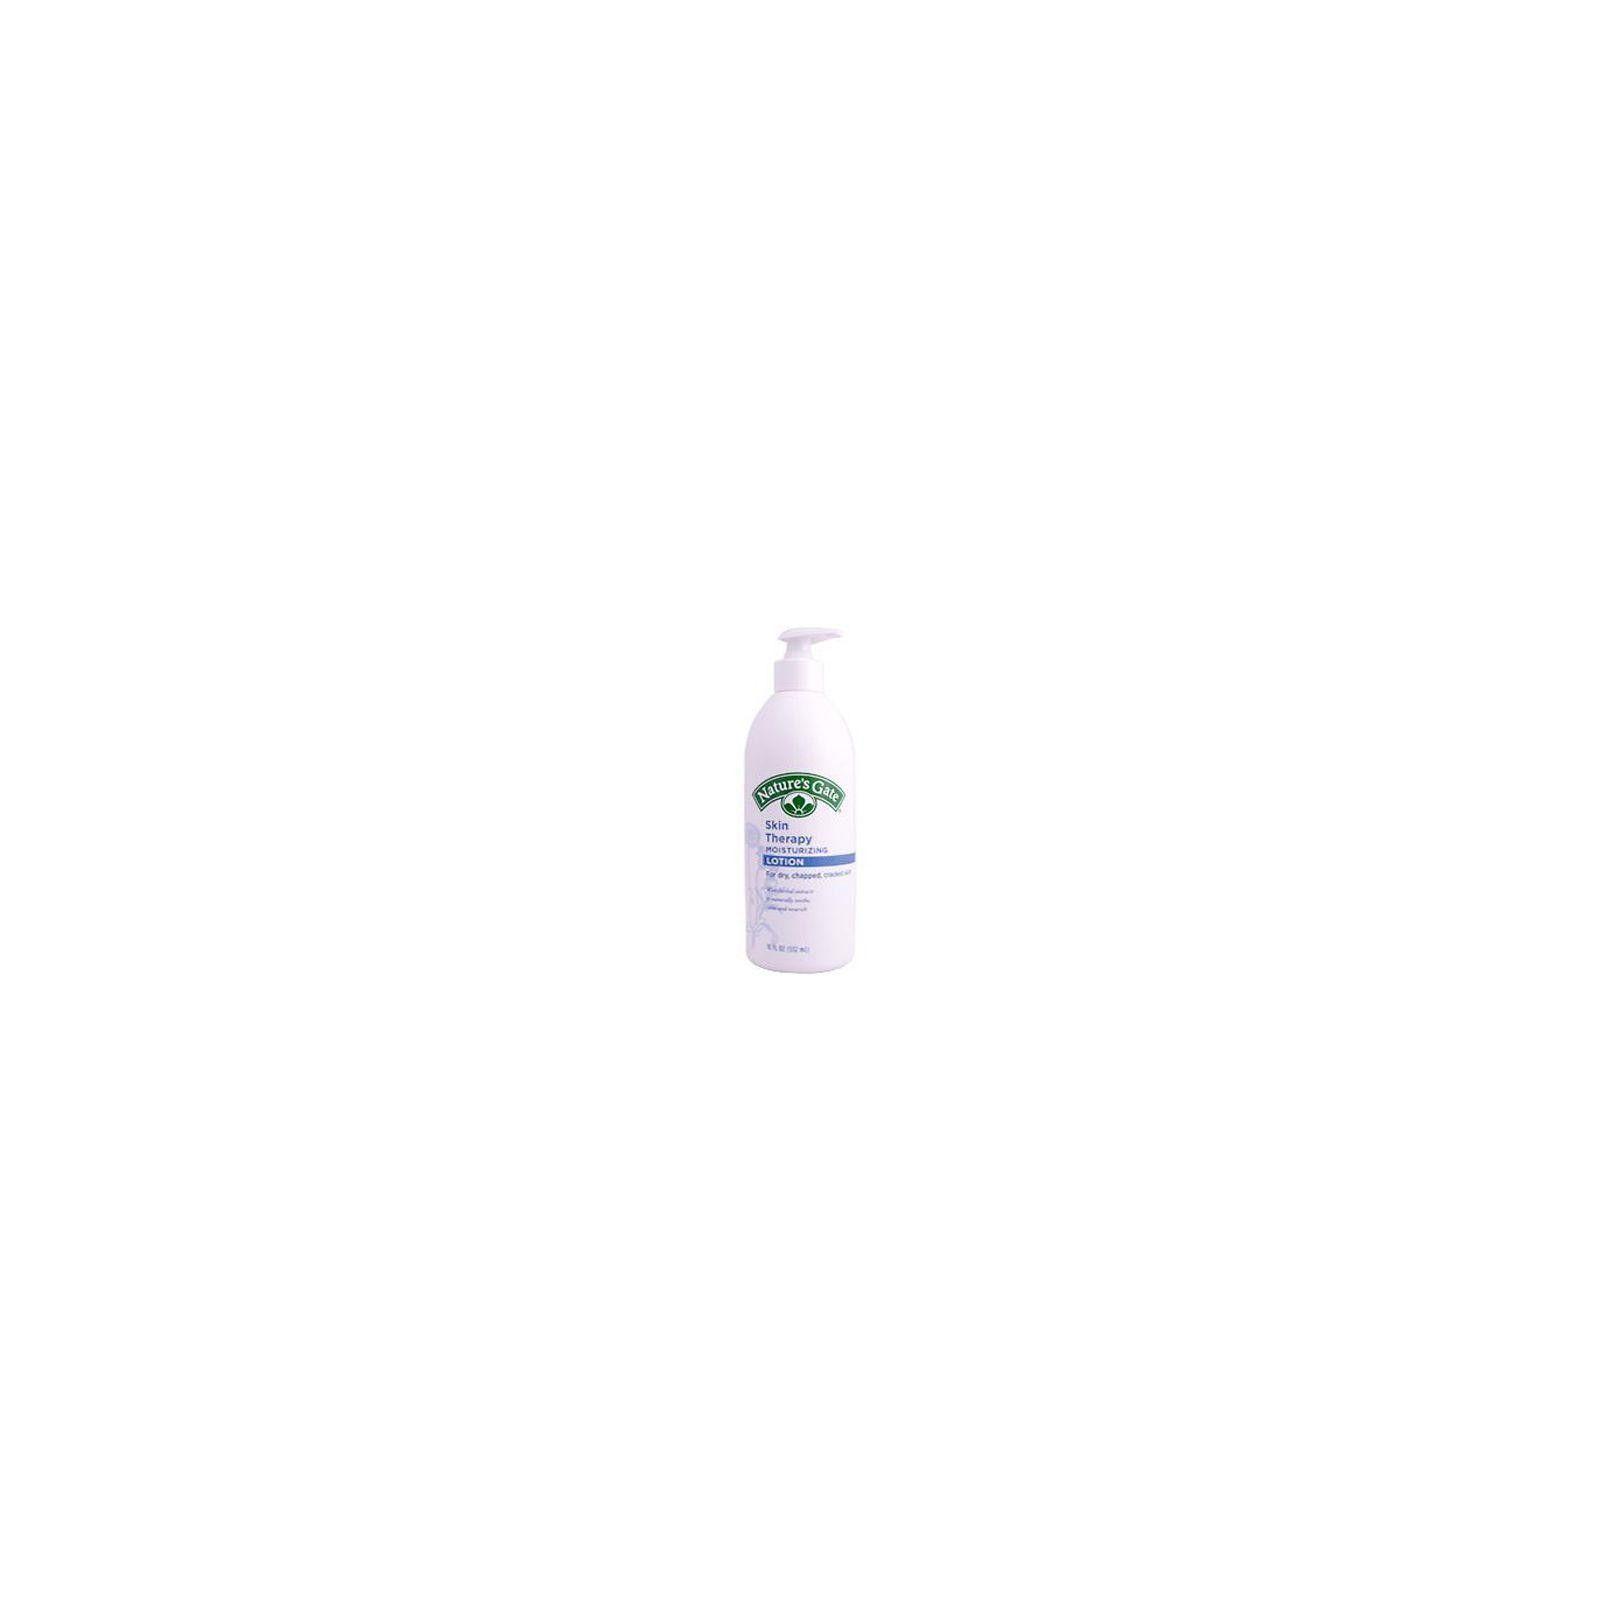 Babo Botanicals Lice Repel Conditioning Spray Rosemary   Fl Oz